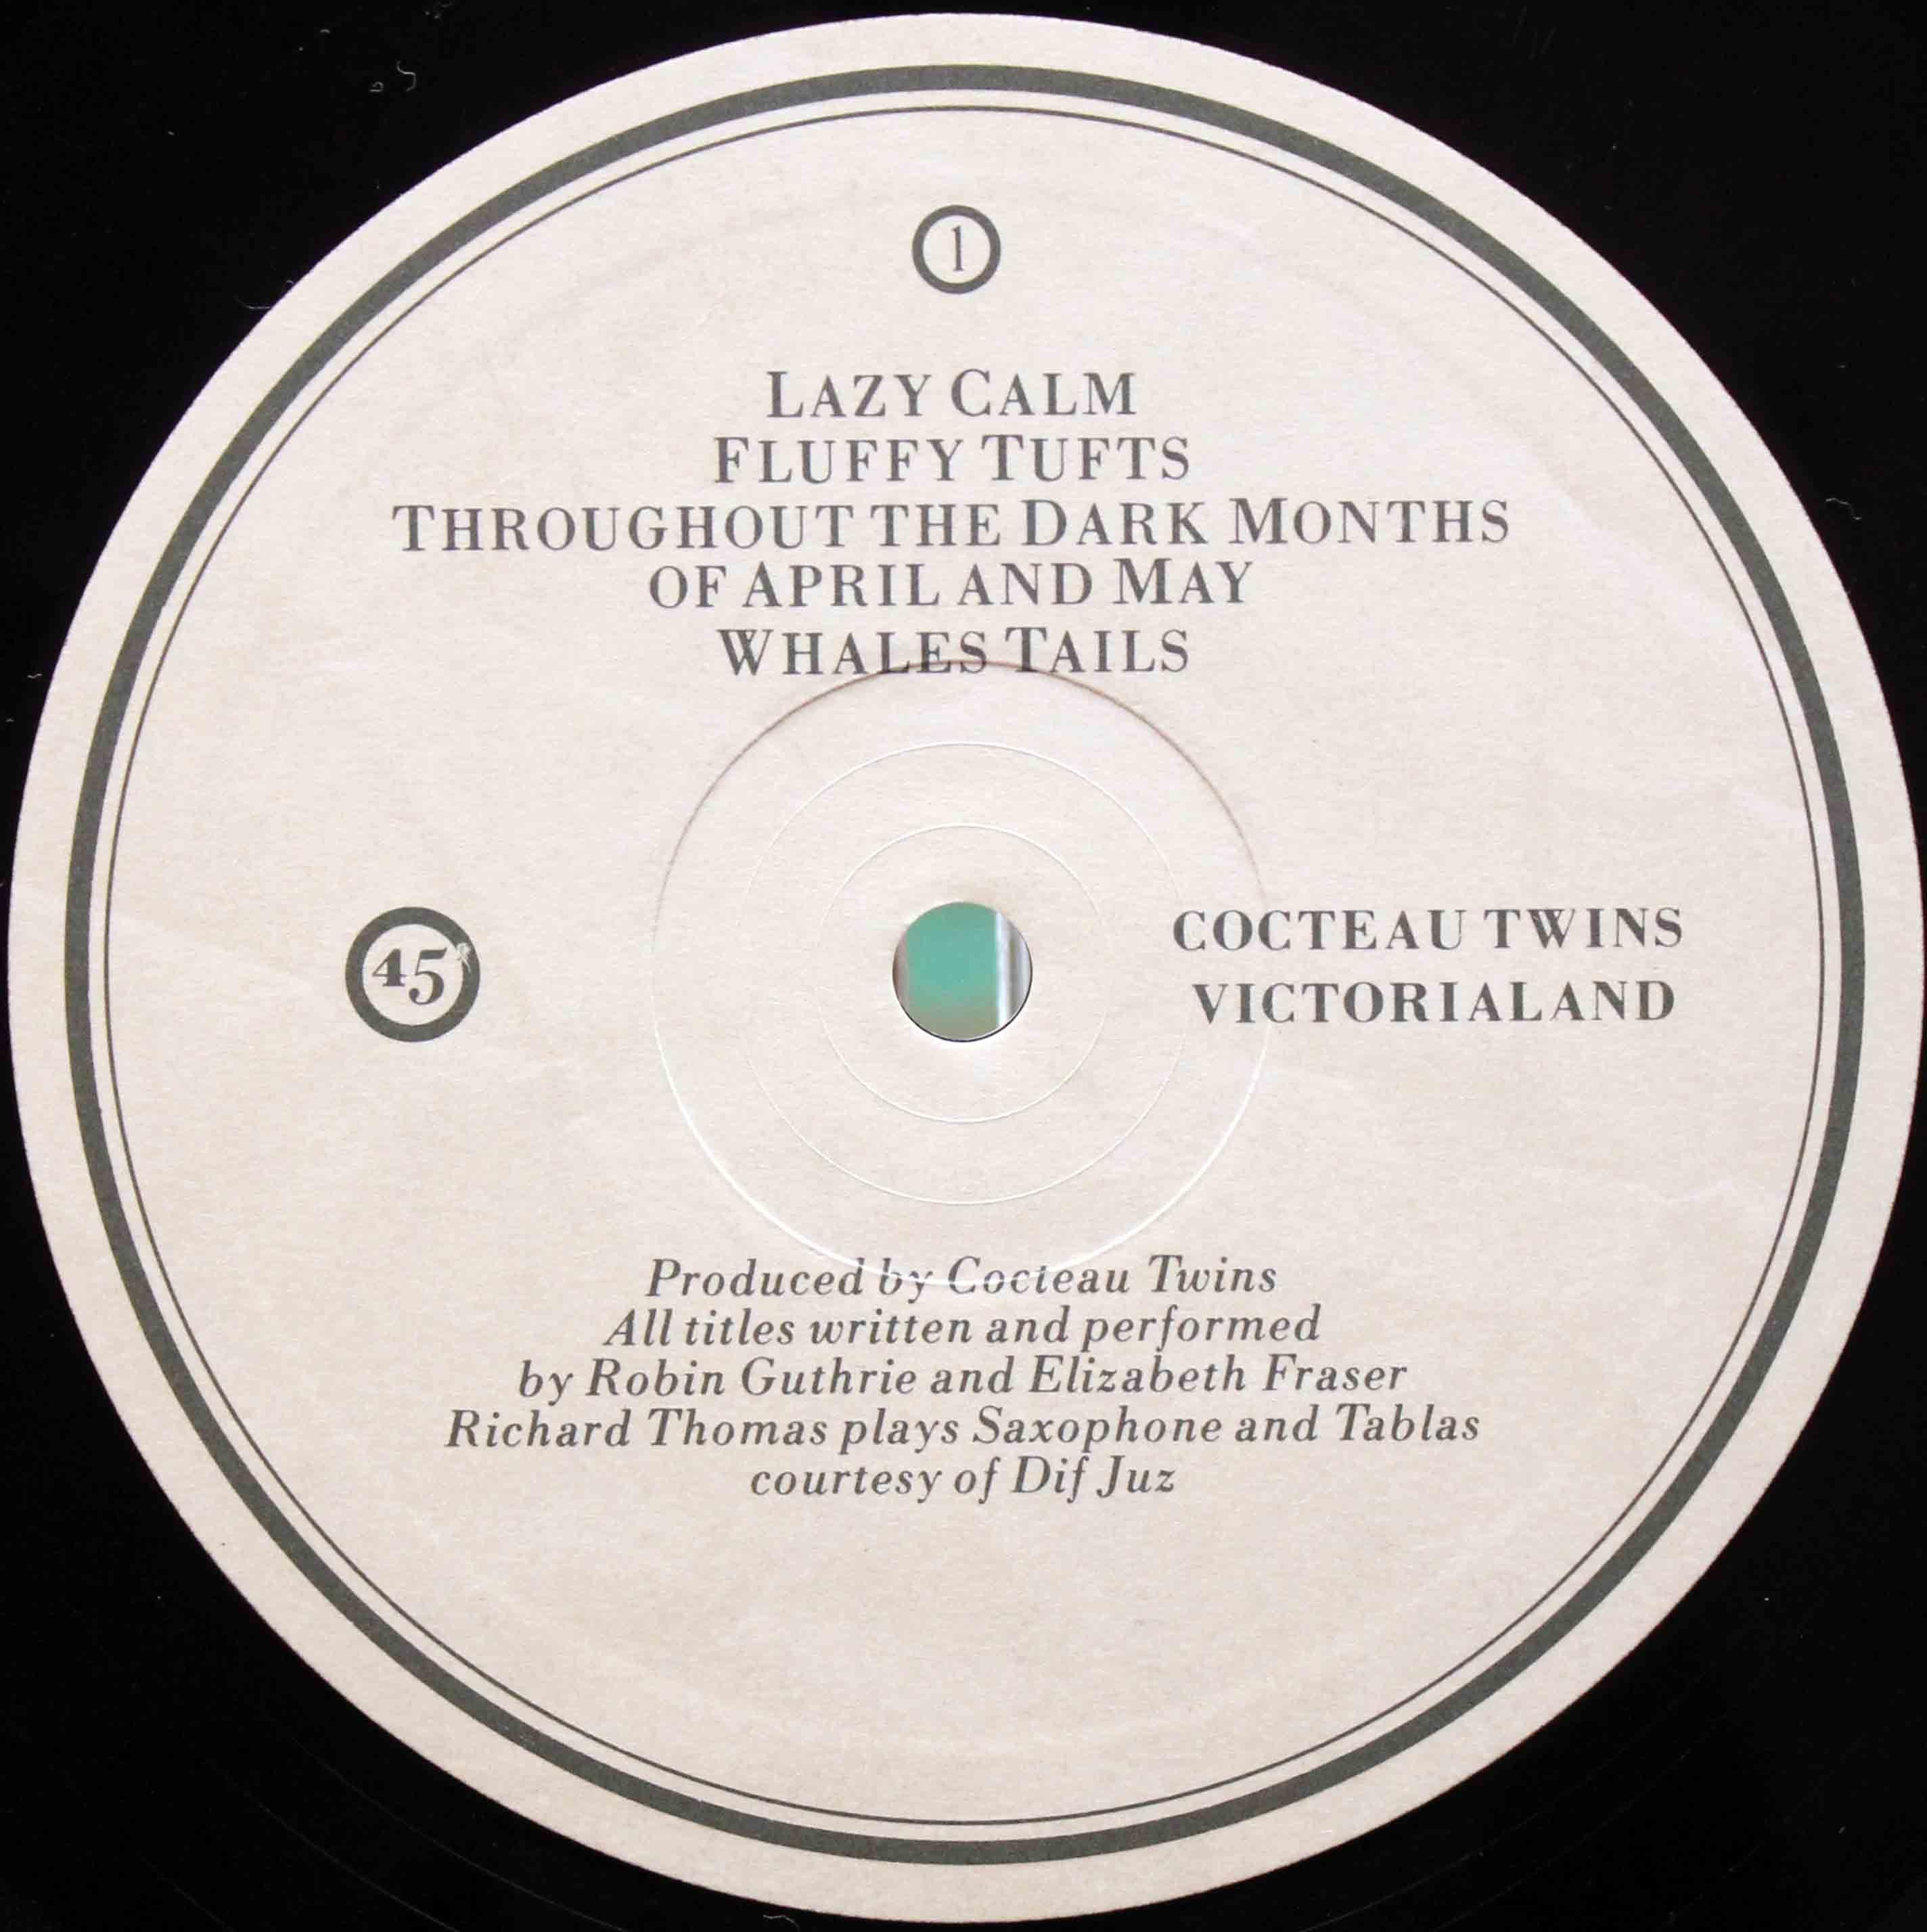 Cocteau Twins – Victorialand 04